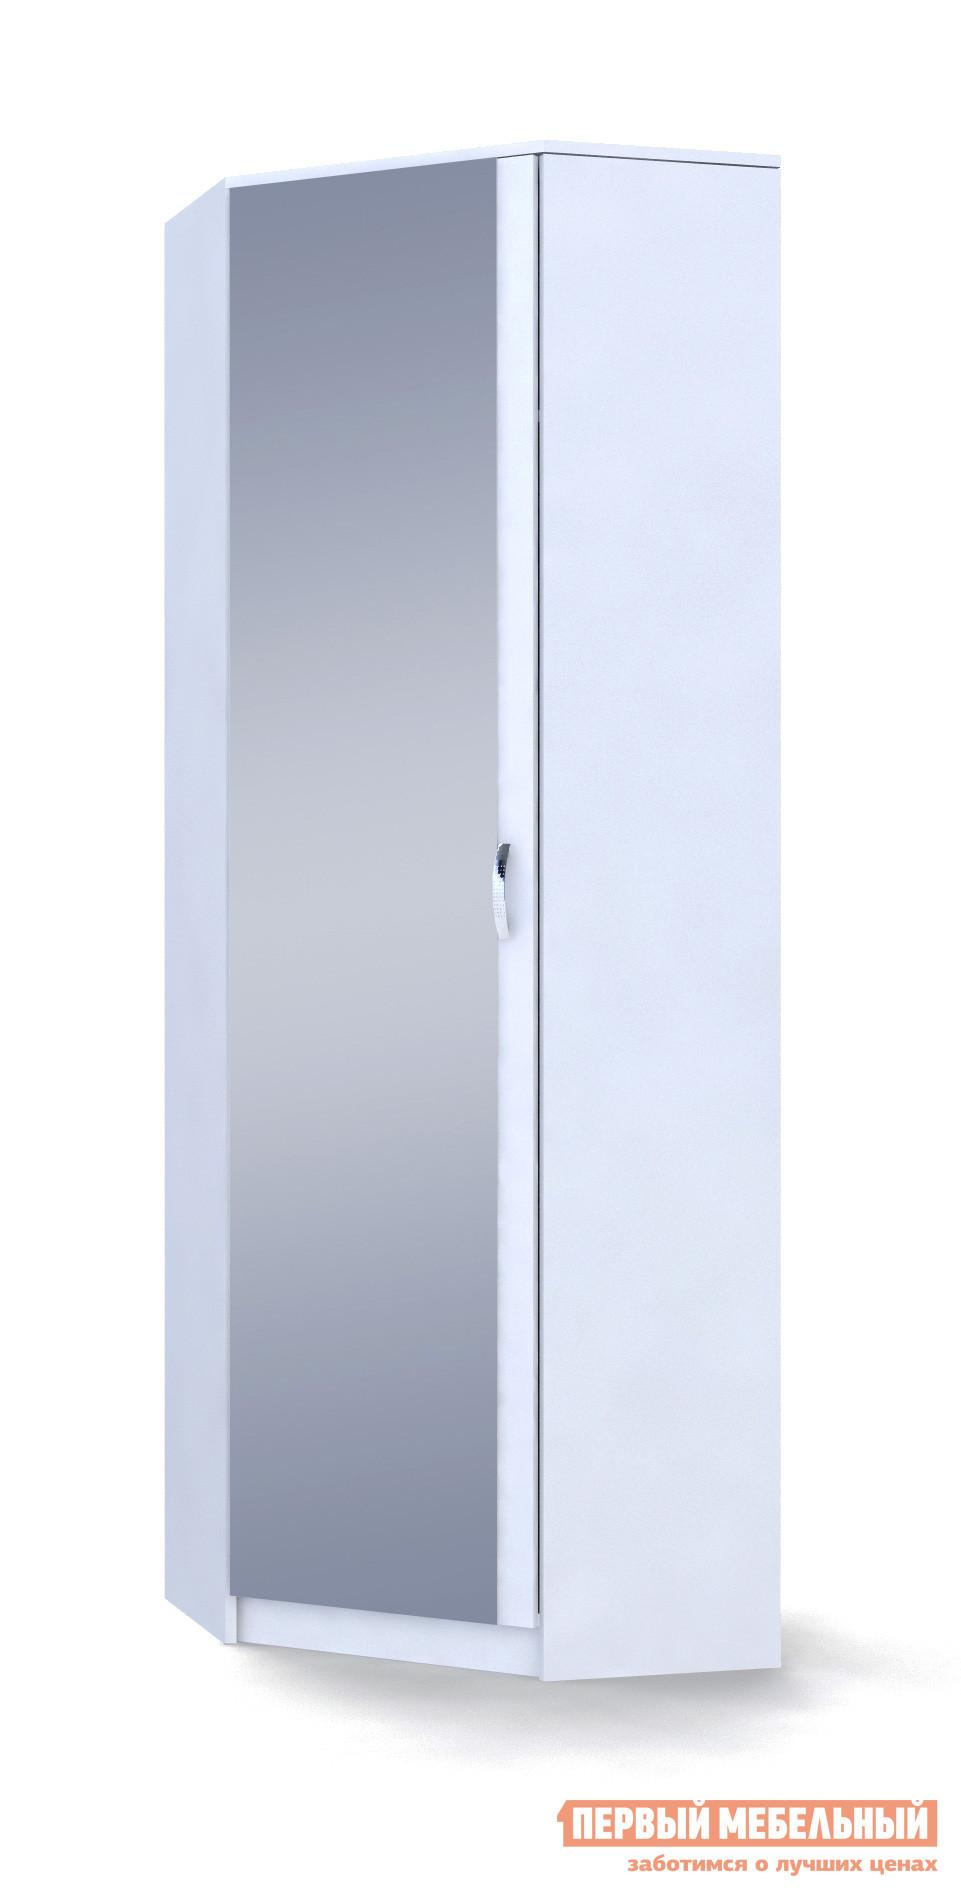 Шкаф распашной МФ Мастер Шкаф угловой с зеркалом (ШУЗ)